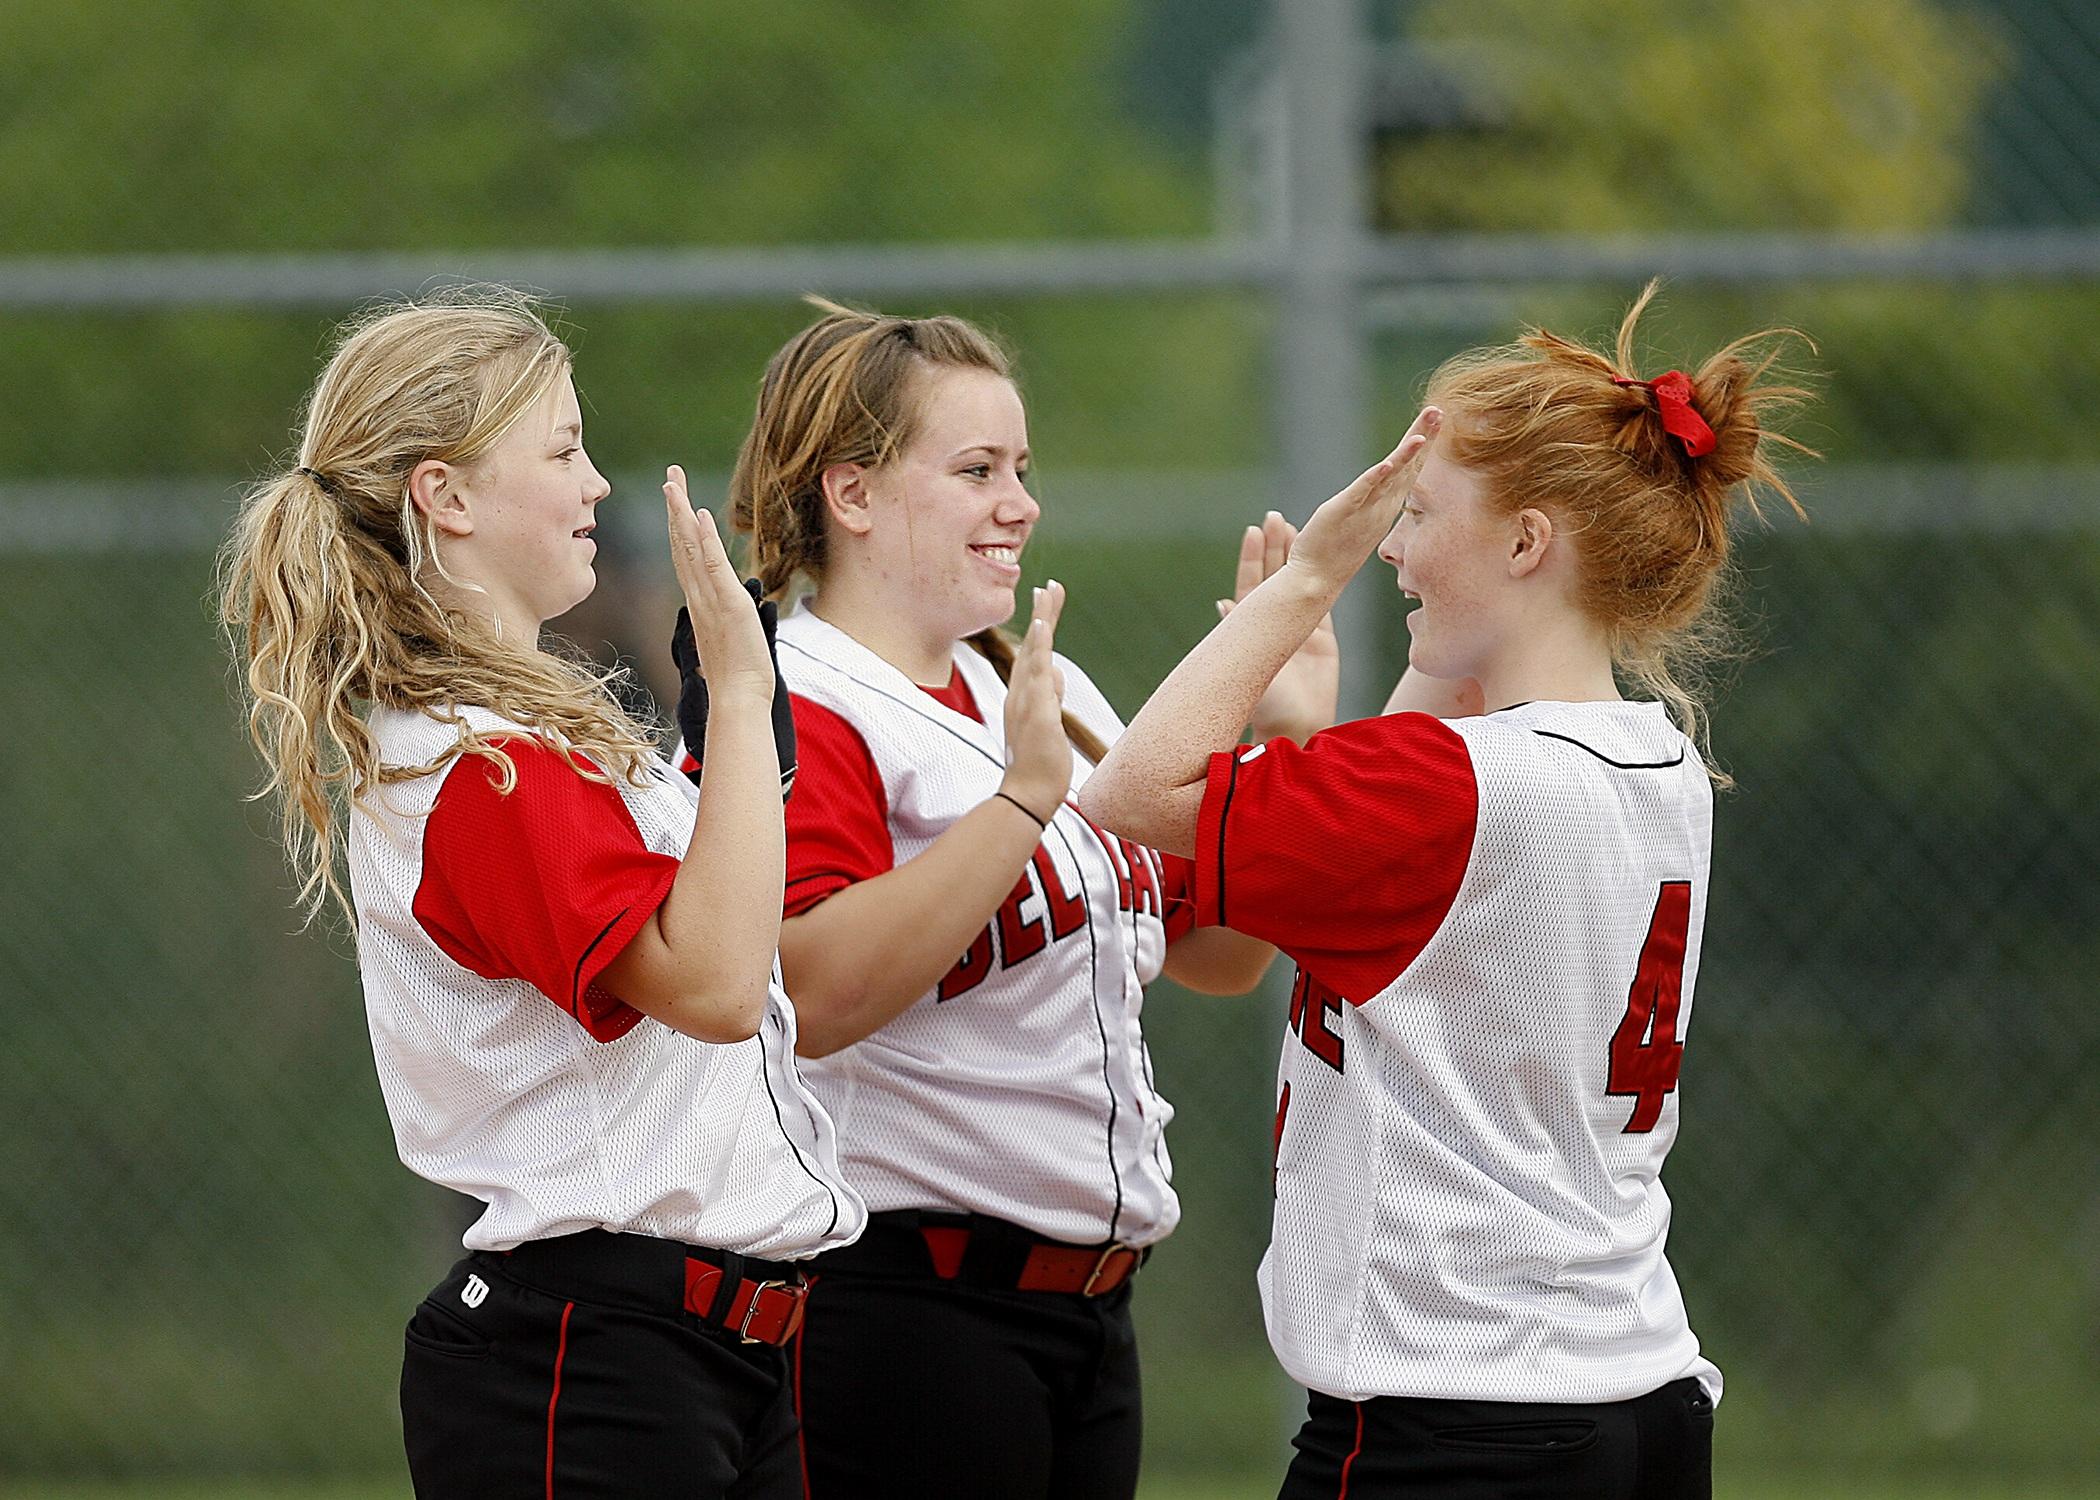 Softball girls team mates happy 163465 %281%29